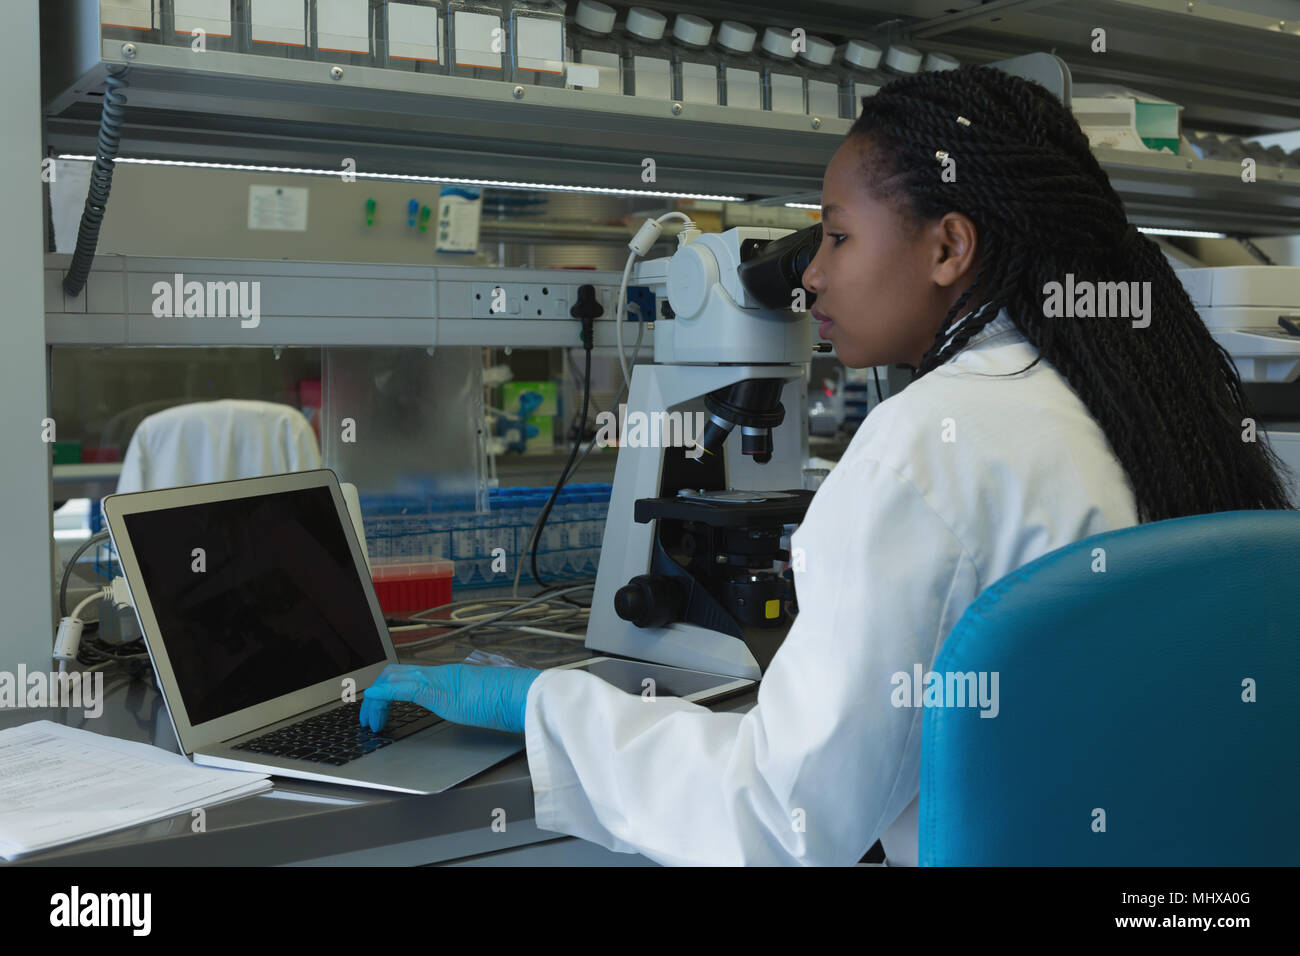 Scientist using laptop at desk - Stock Image